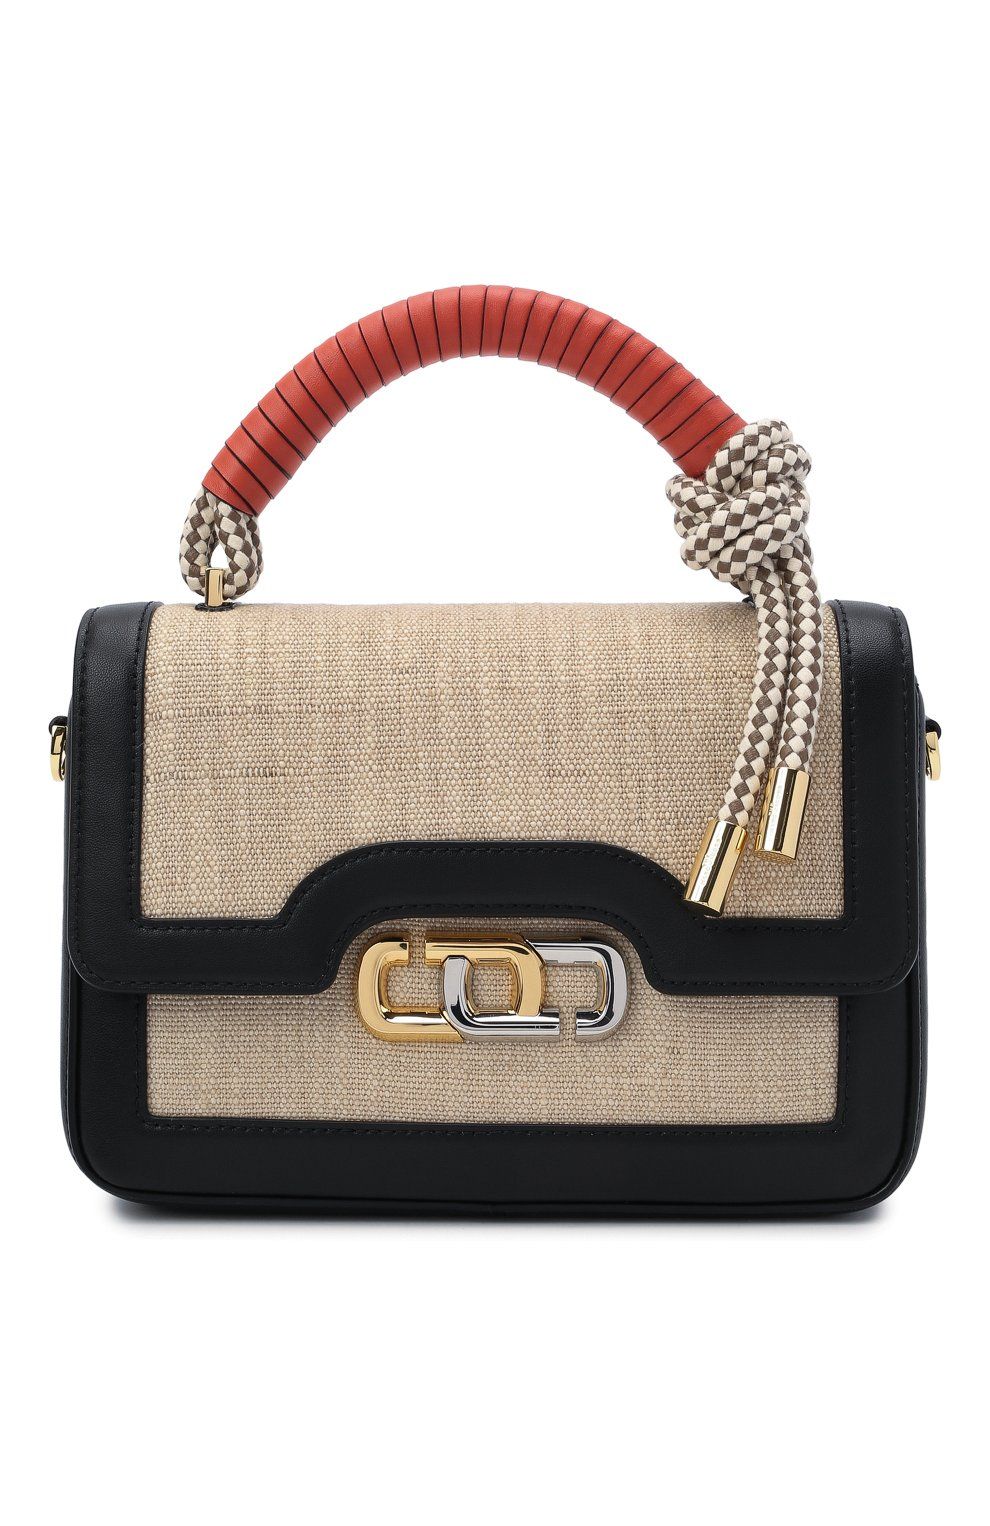 Женская сумка the j link MARC JACOBS (THE) бежевого цвета, арт. H901M02PF21 | Фото 1